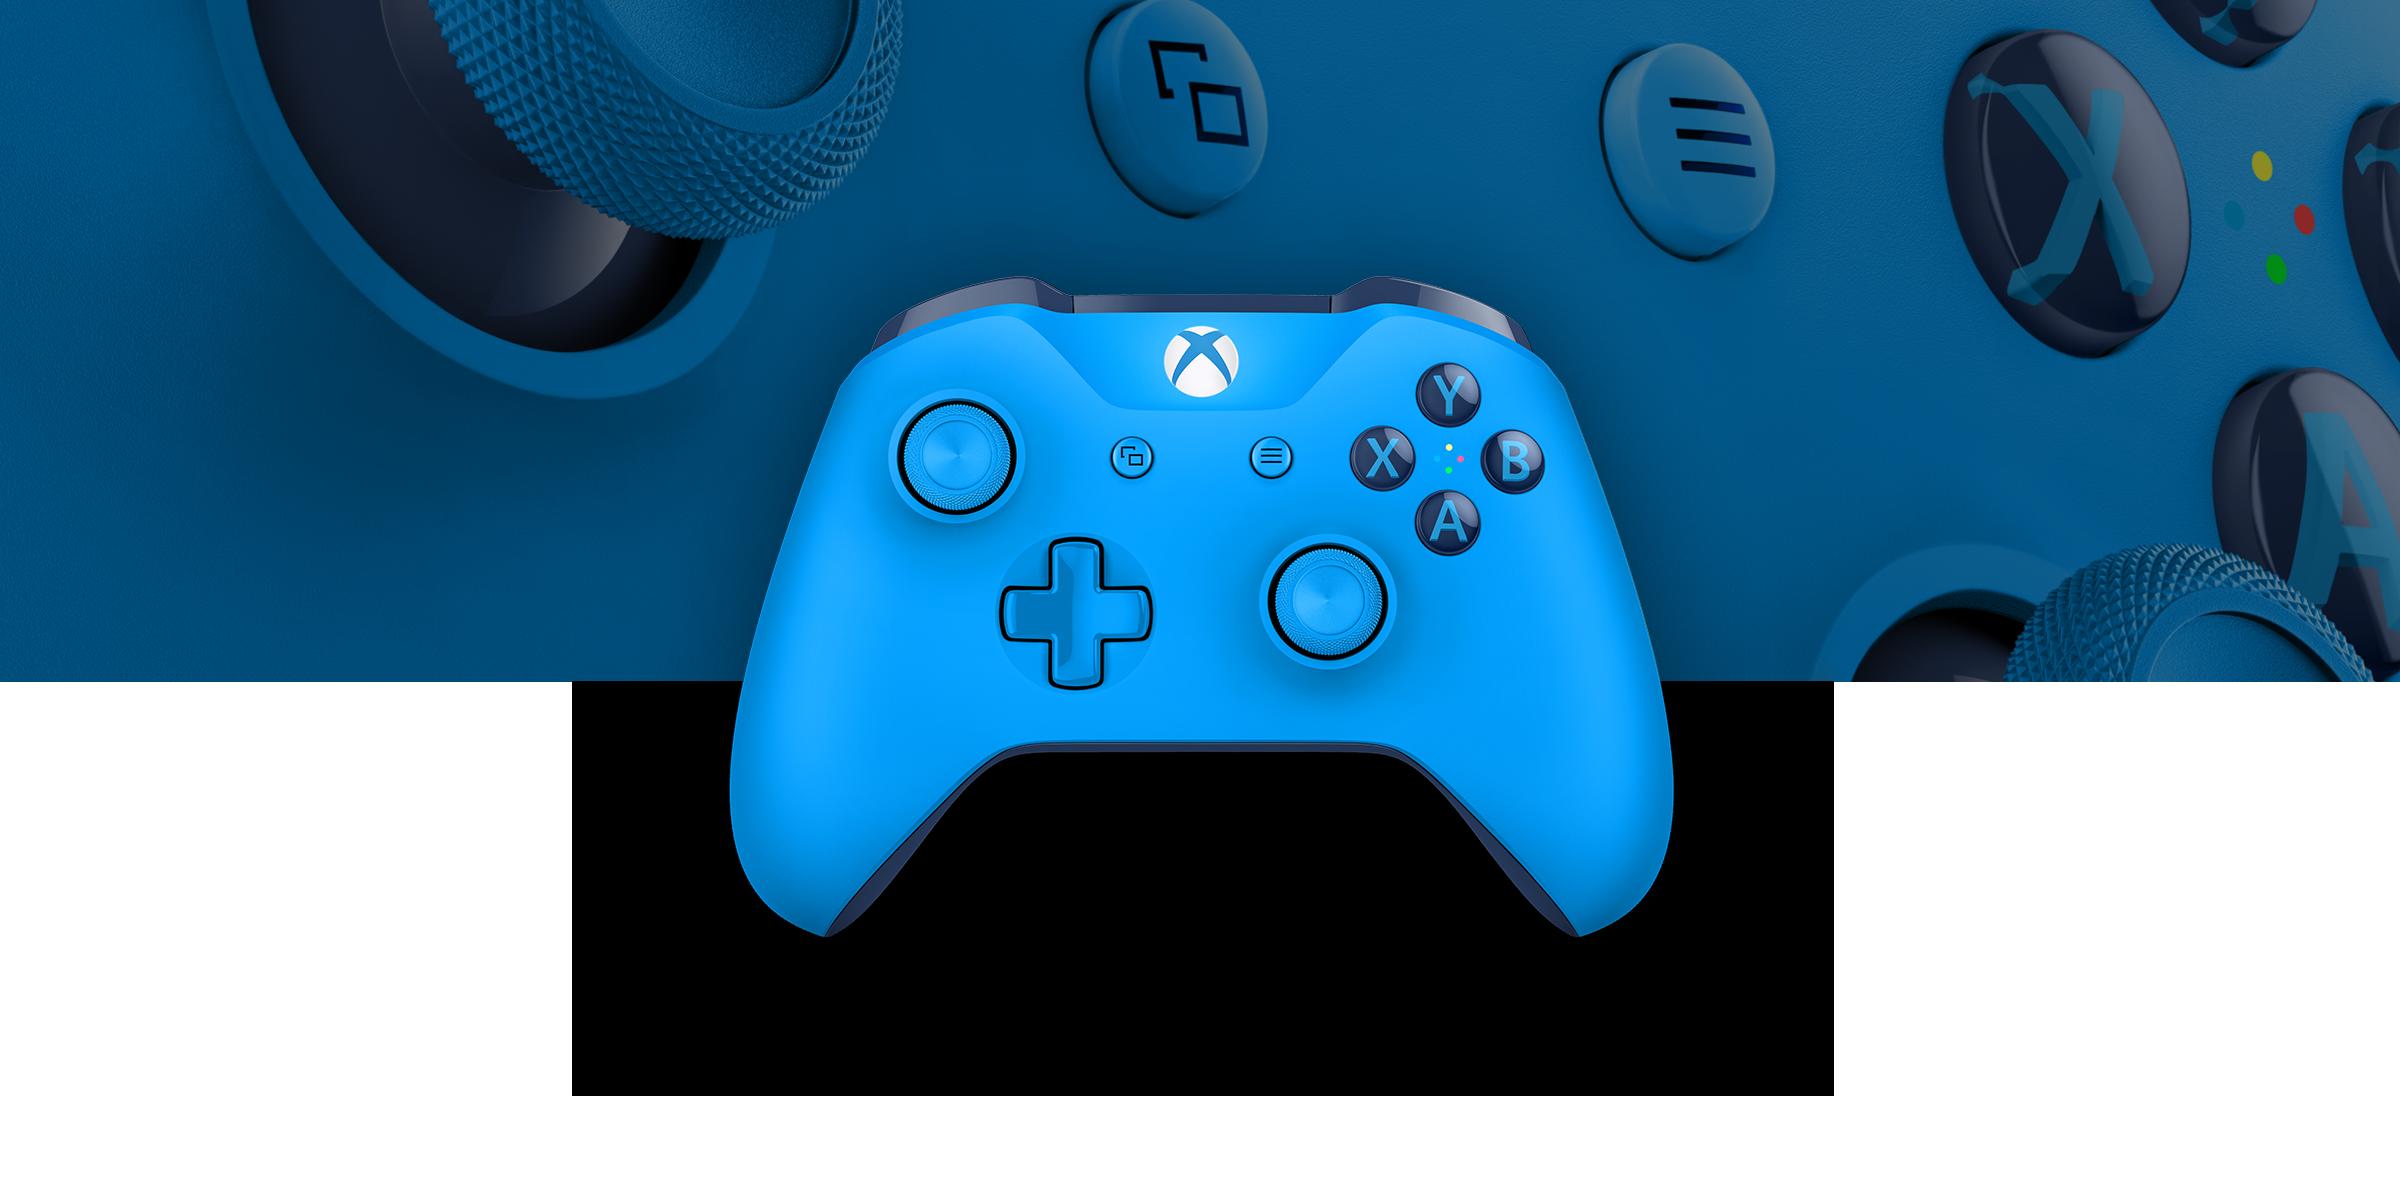 Xbox Blue Wireless Controller